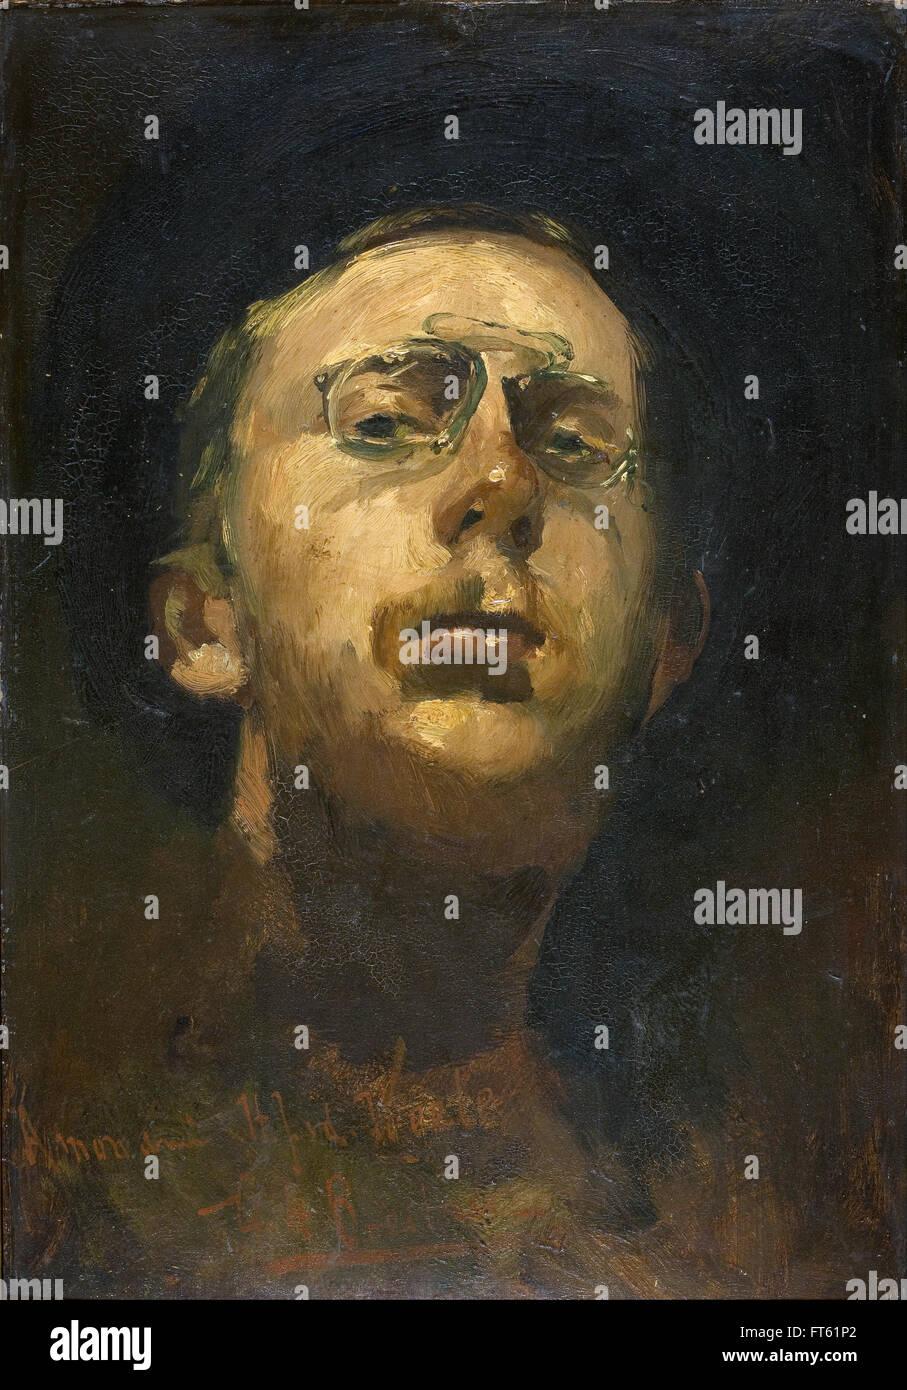 George Hendrik Breitner - Self-portrait with pince-nez - Gemeentemuseum Stock Photo